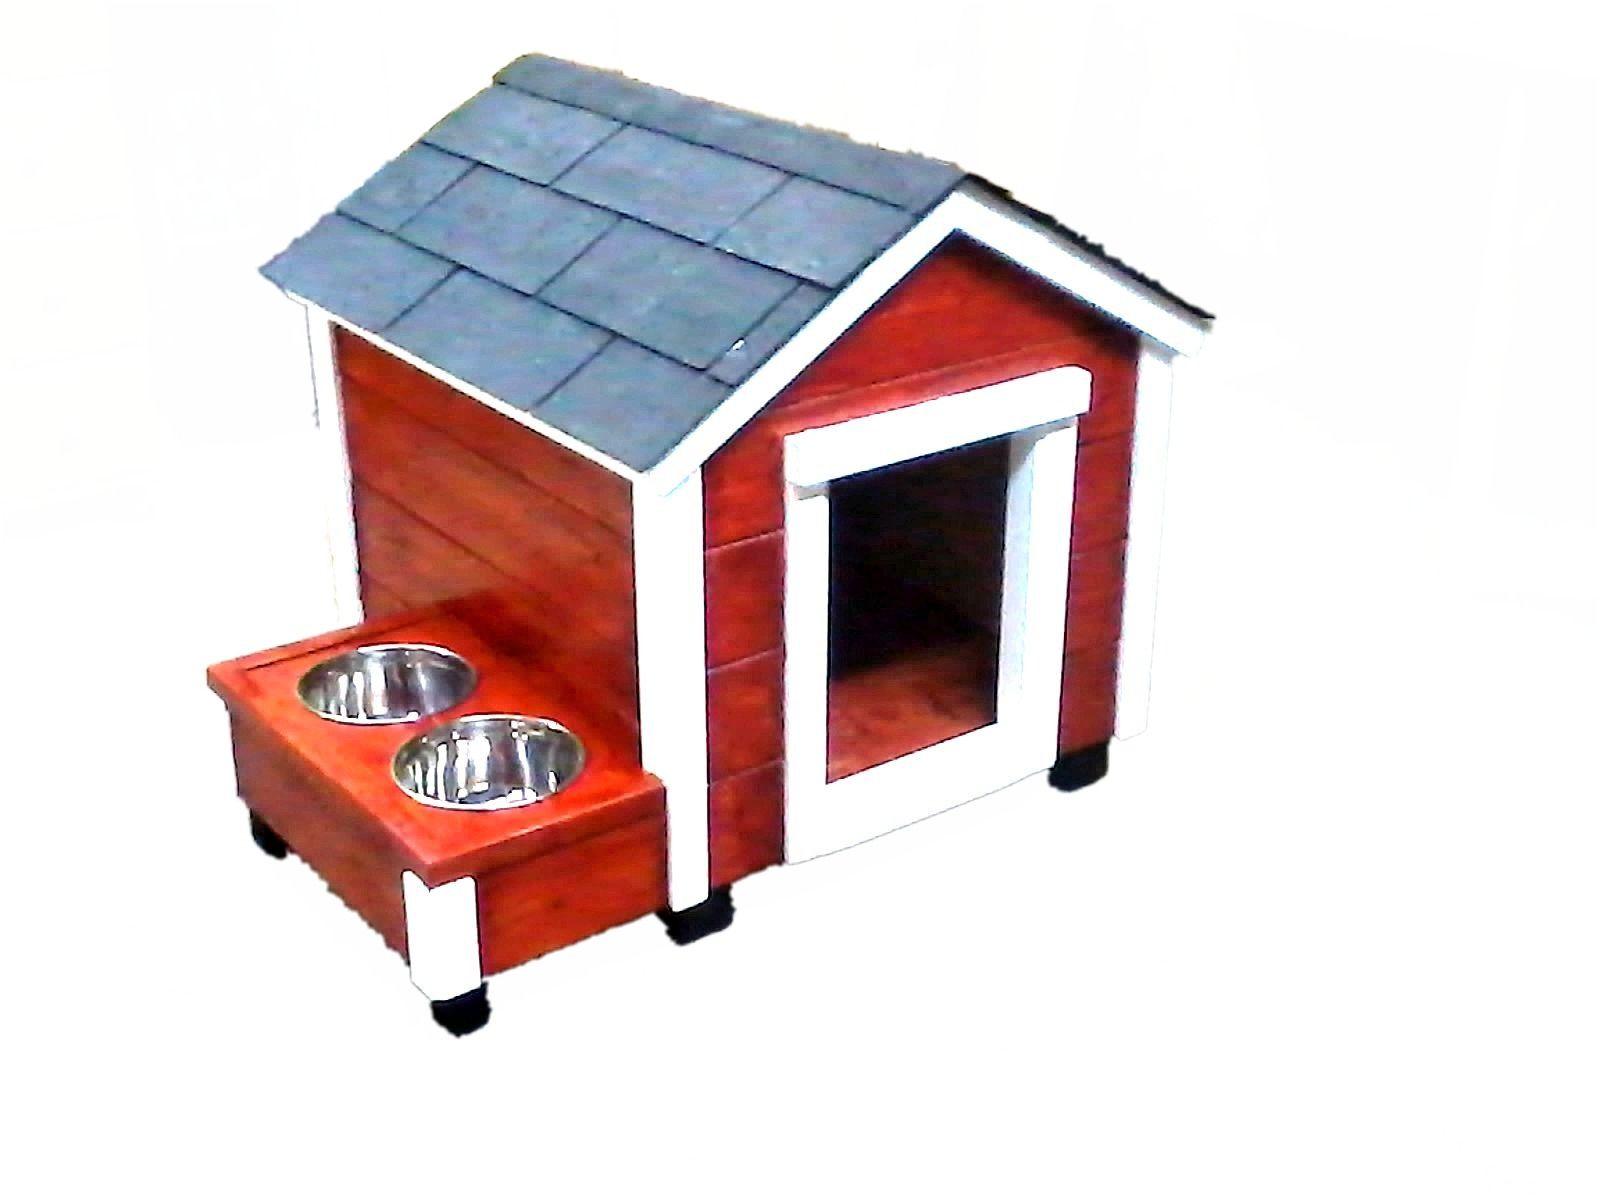 Casetas de madera para perros anuncios gratis barcelona for Casetas para guardar cosas